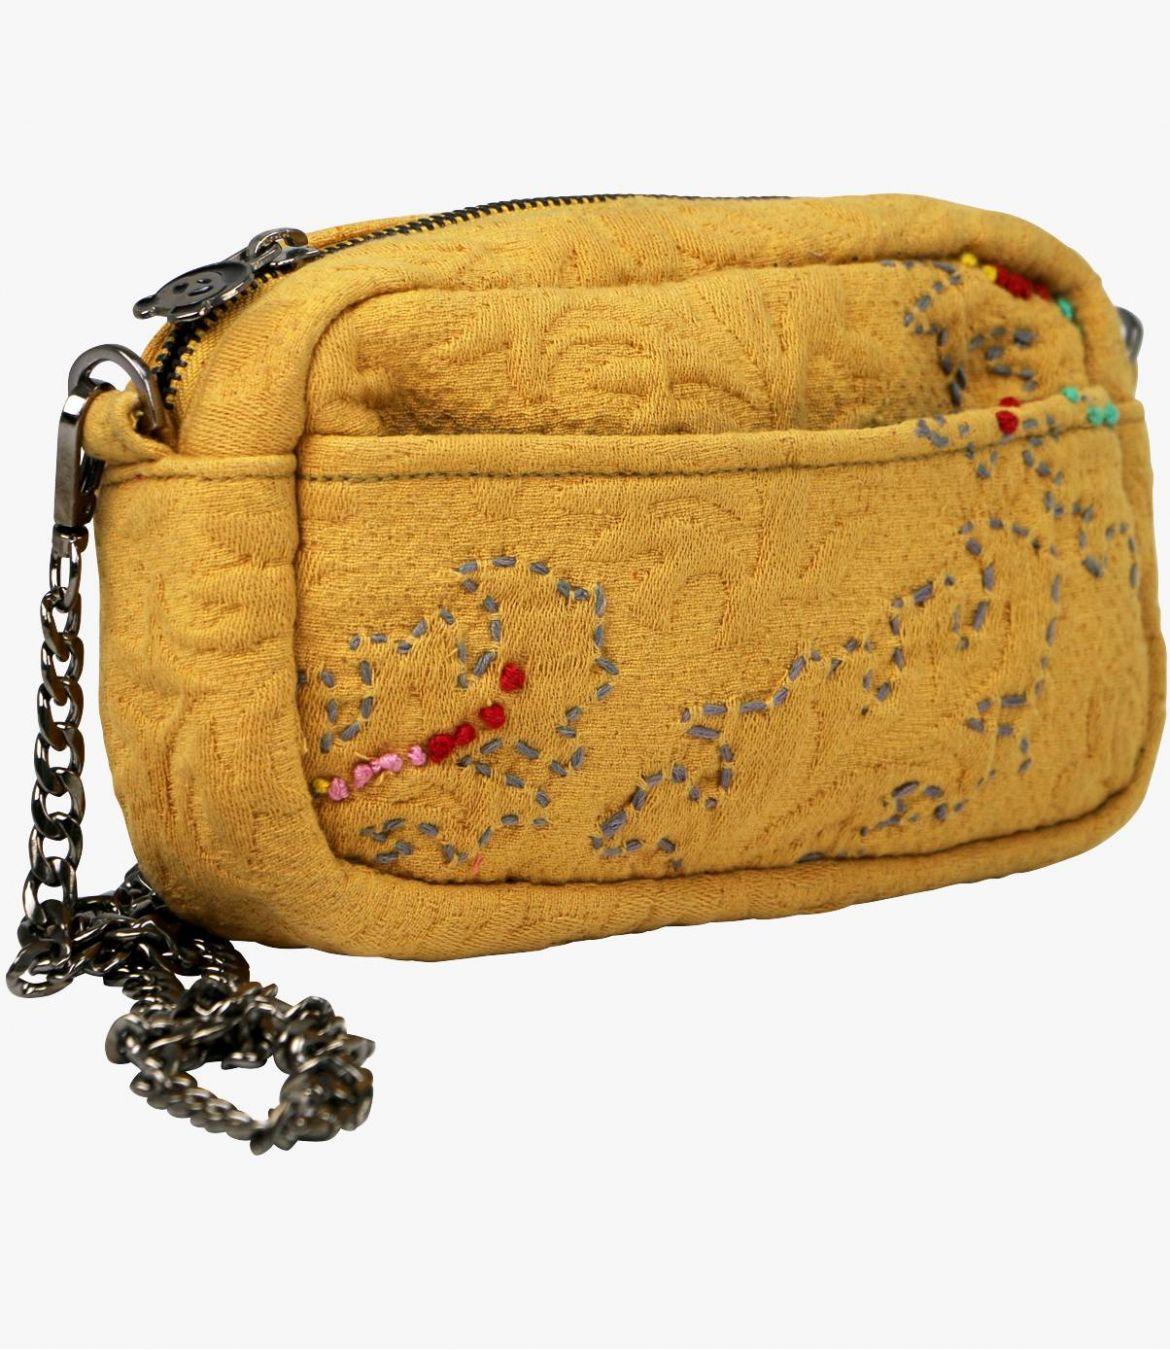 NIGHT - GAMME VILLE Women's Cotton Pocket 19x11x6cm Storiatipic - 3